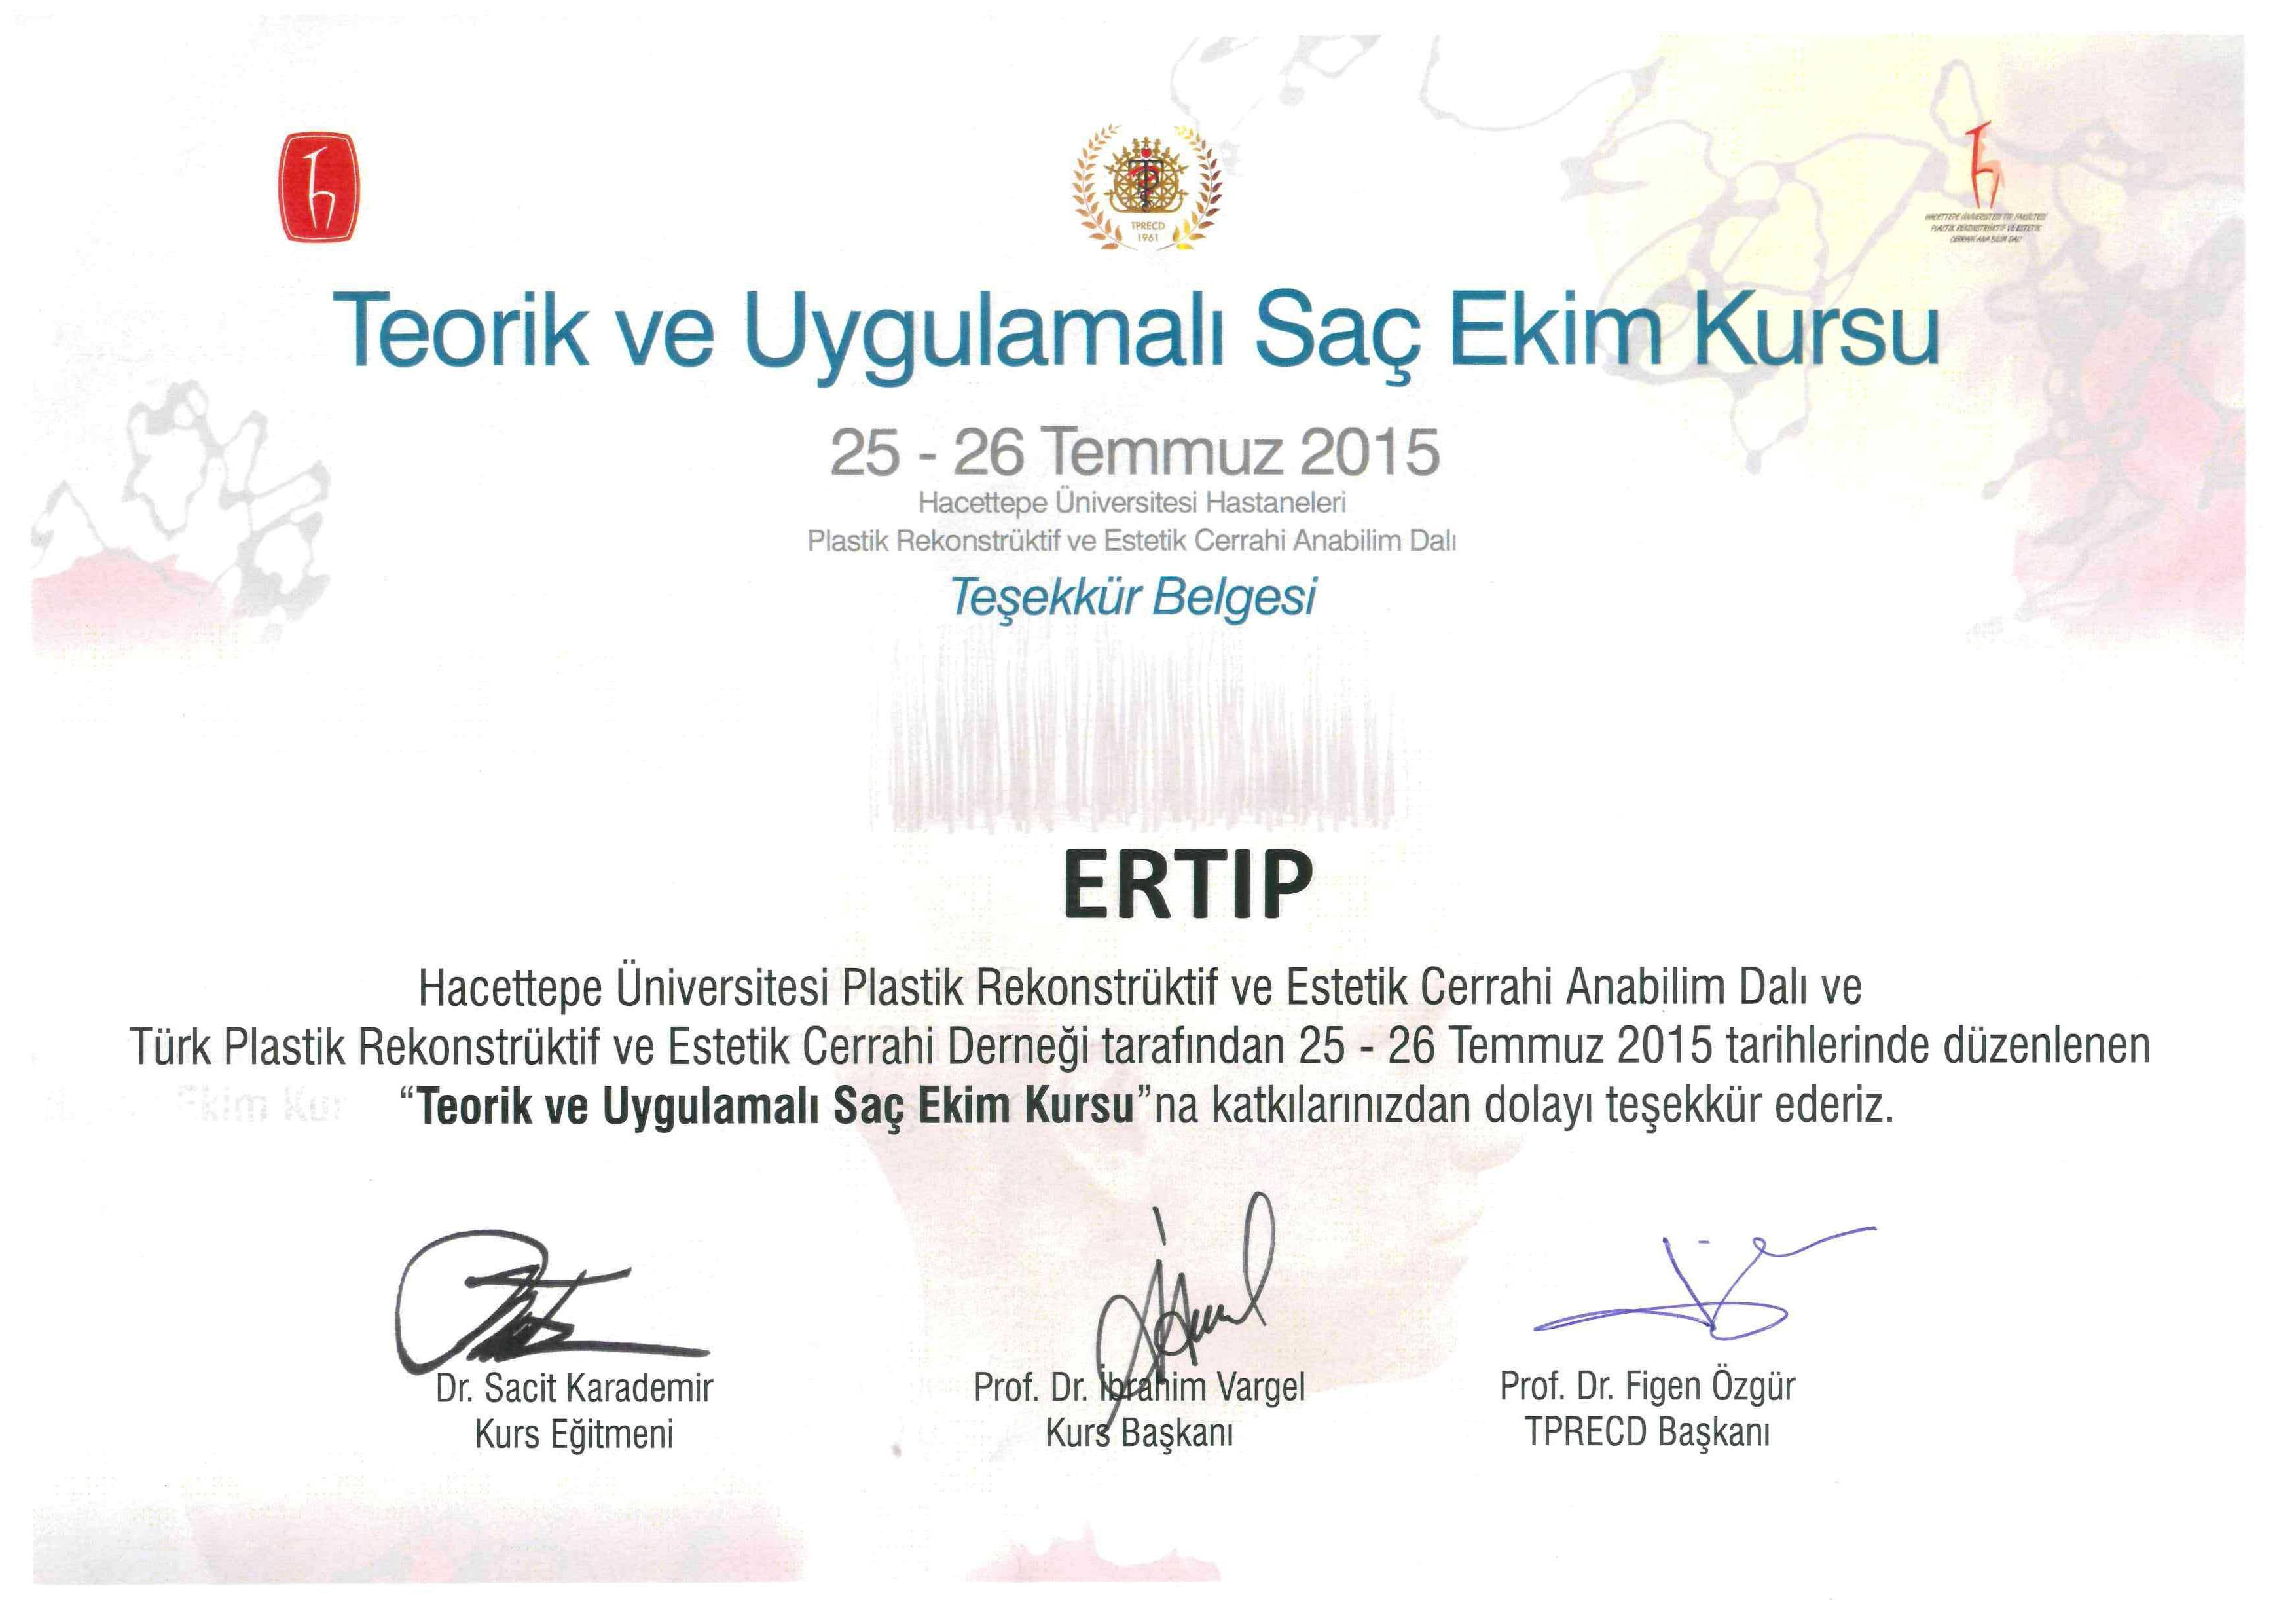 Hacettepe University Medicine Faculty Plastic Reconstructive and Esthetic Surgery Live Surgery Works